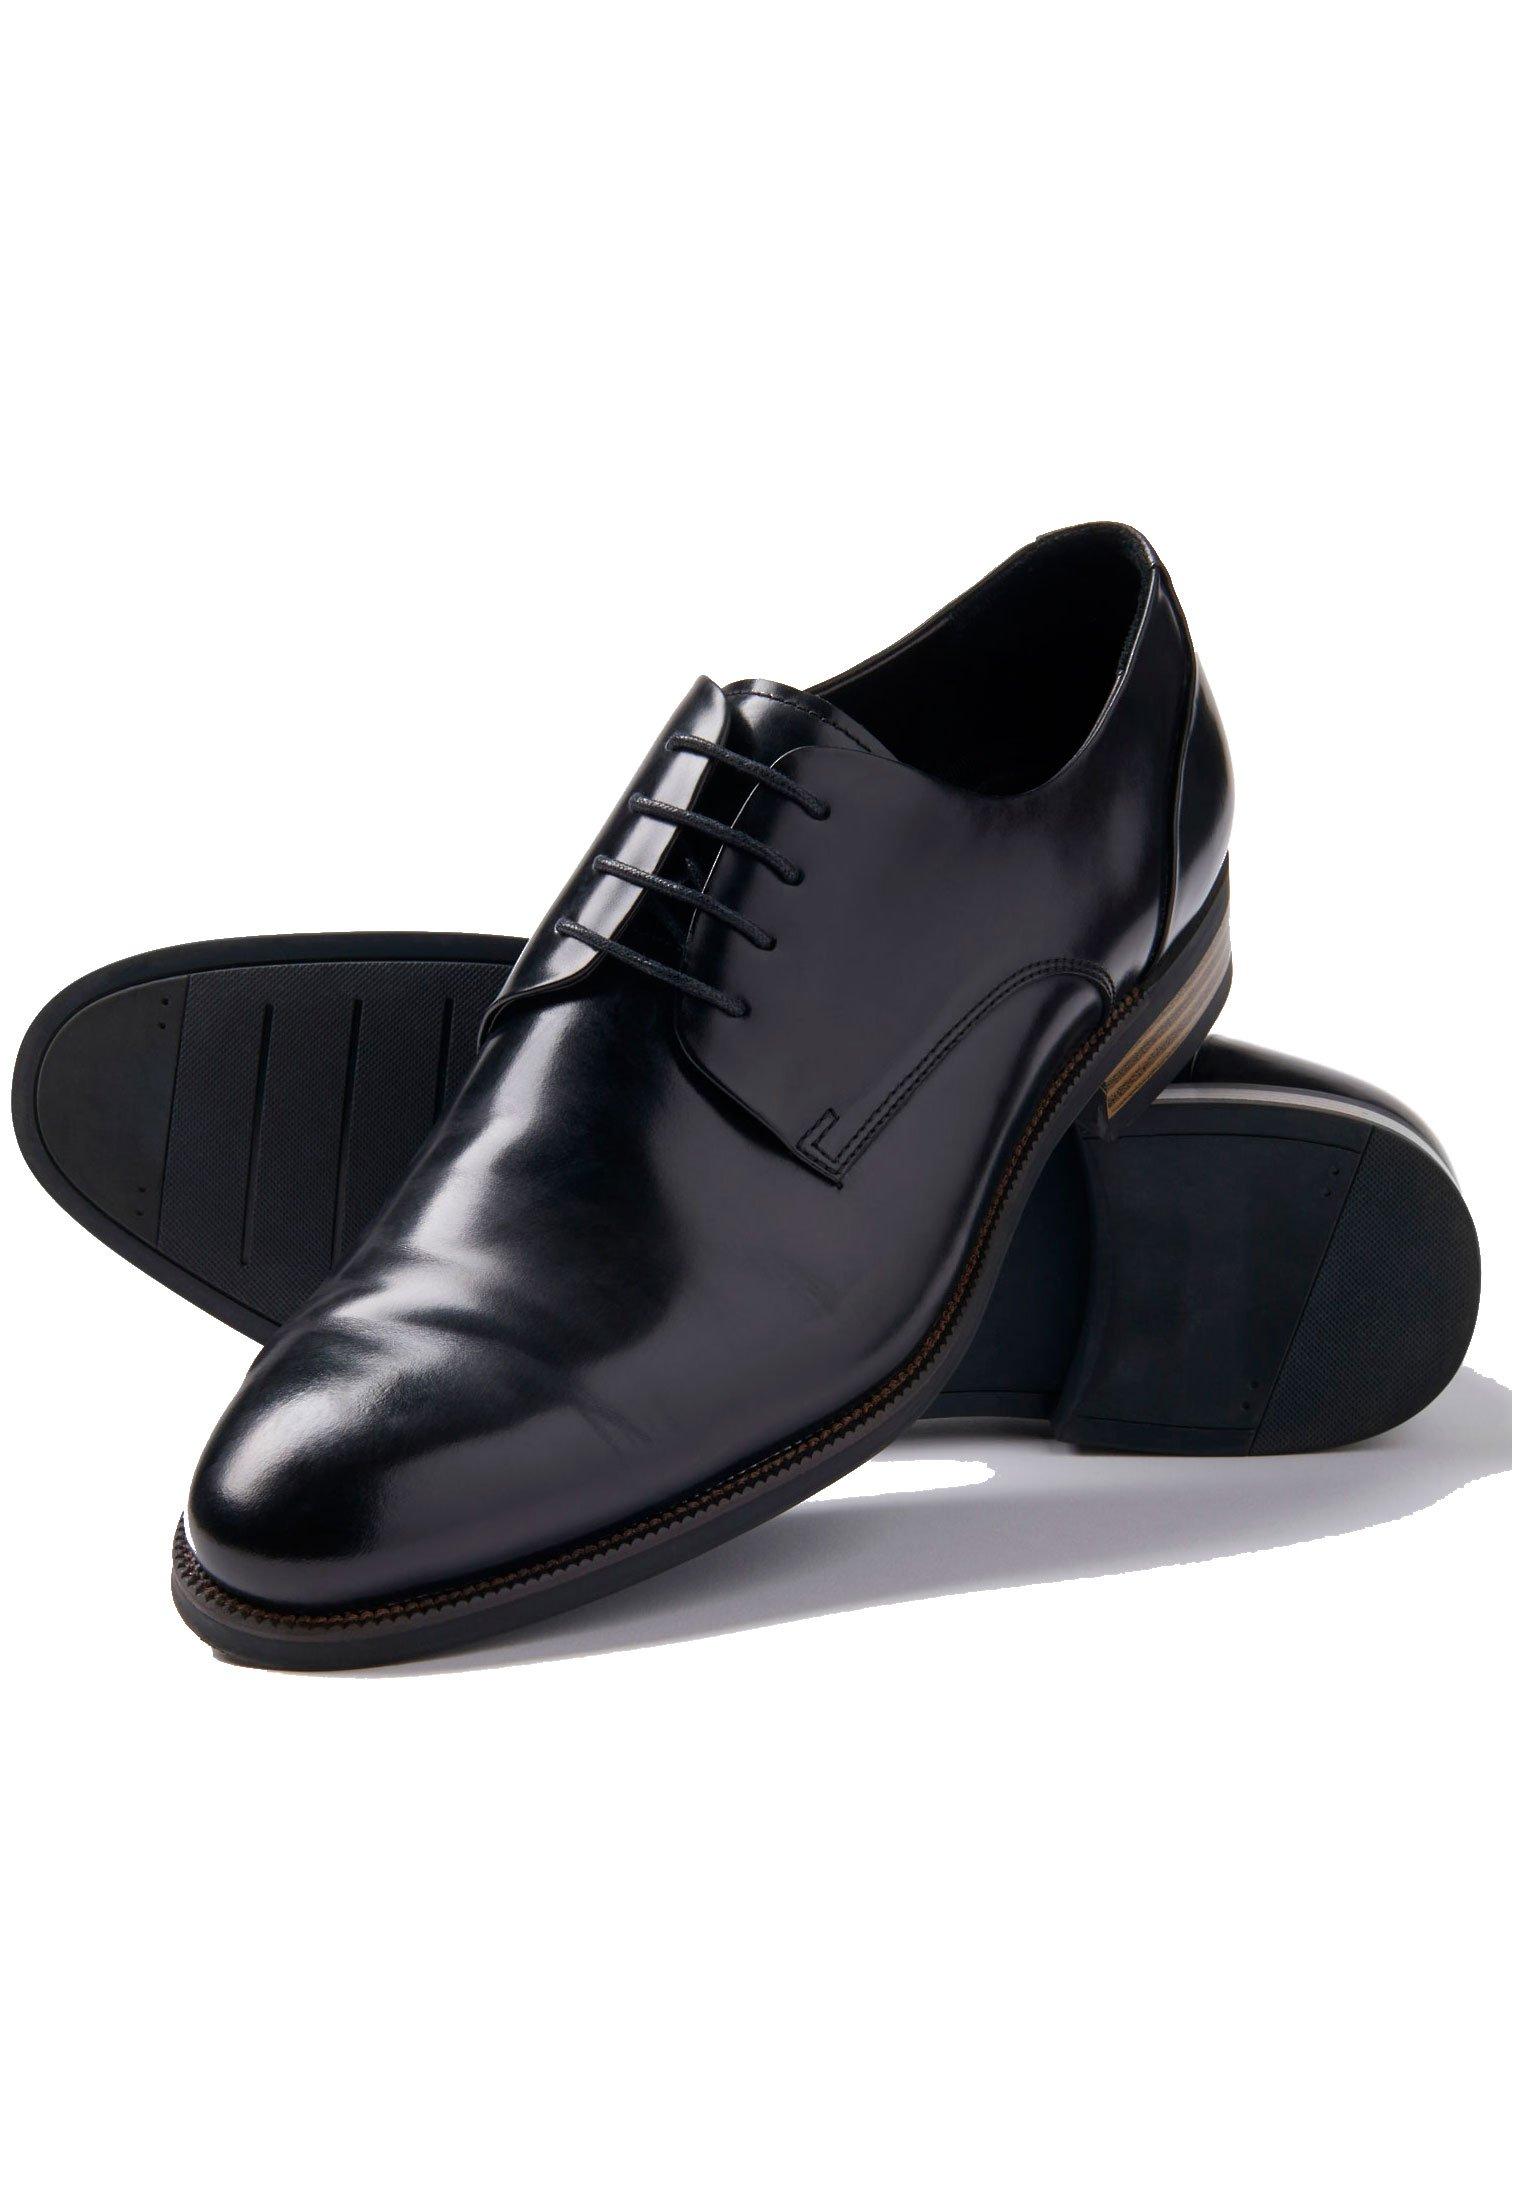 Black Elms Shoe With Rubber Sole